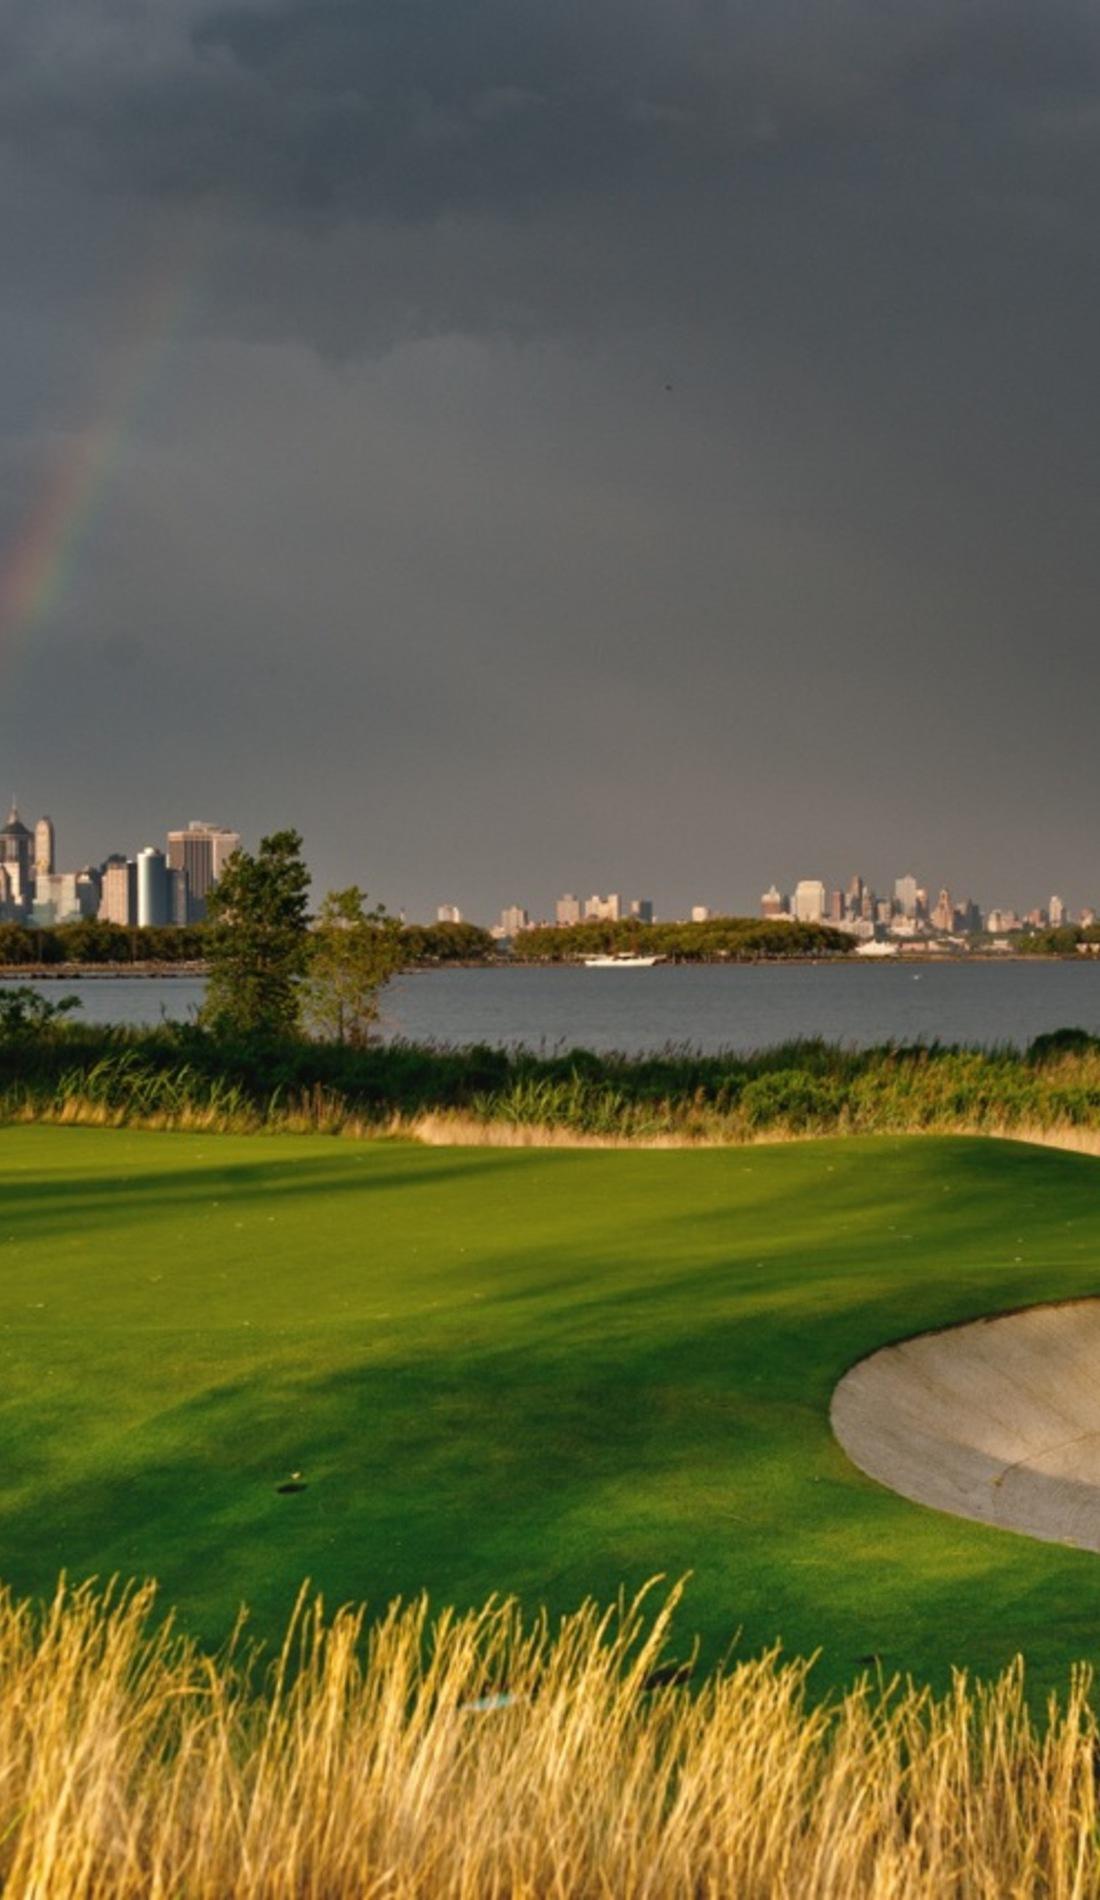 A Barclays Golf Classic live event